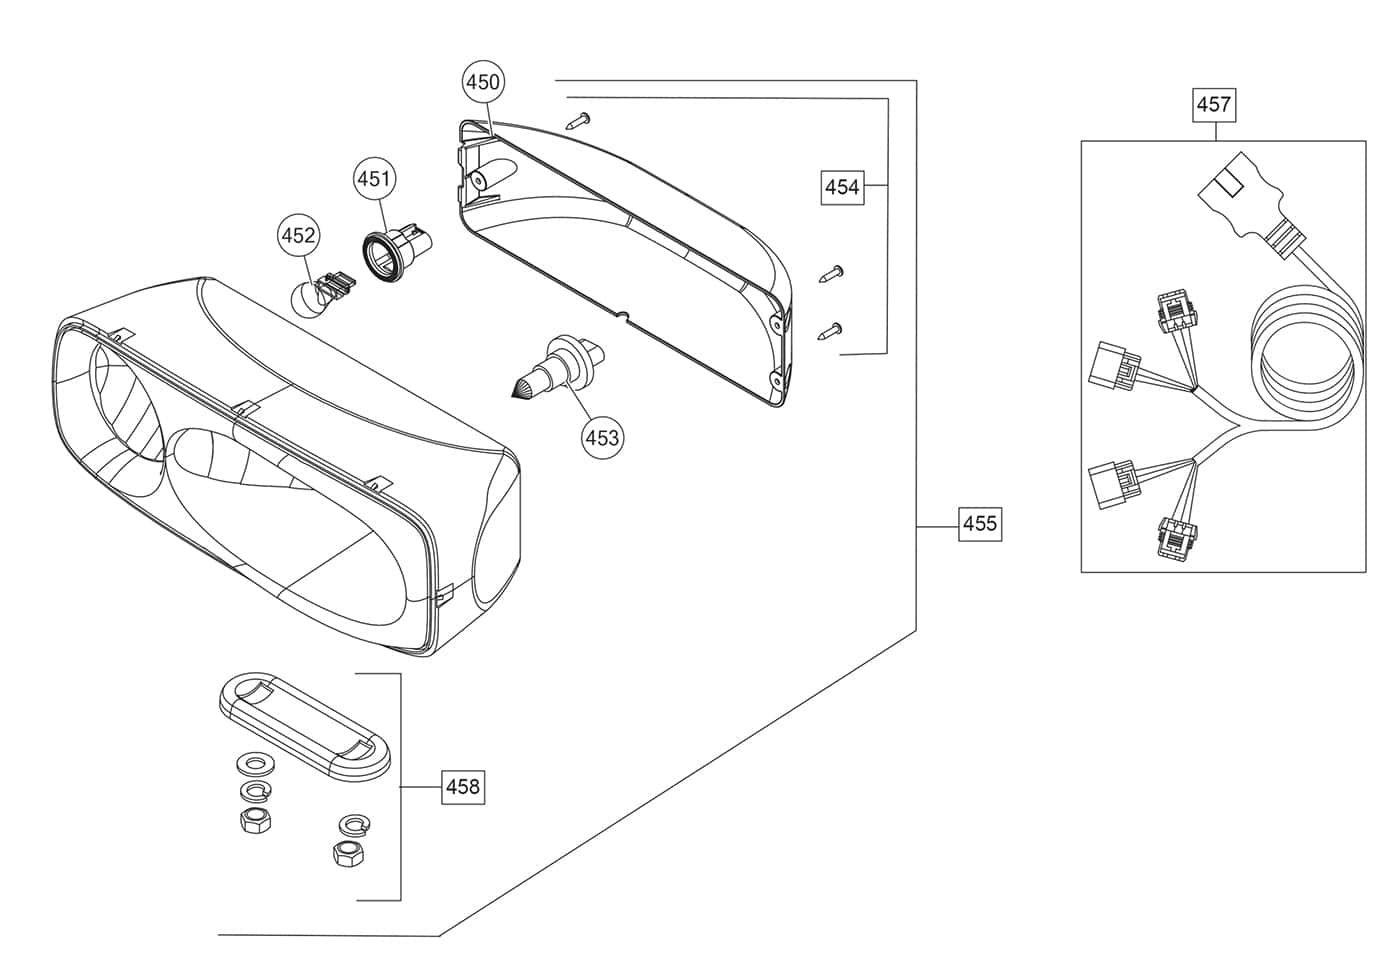 hight resolution of vanner series 20 1000t remote switch wiring diagram 51 snowdogg wiring harness lights ex85 snow dog